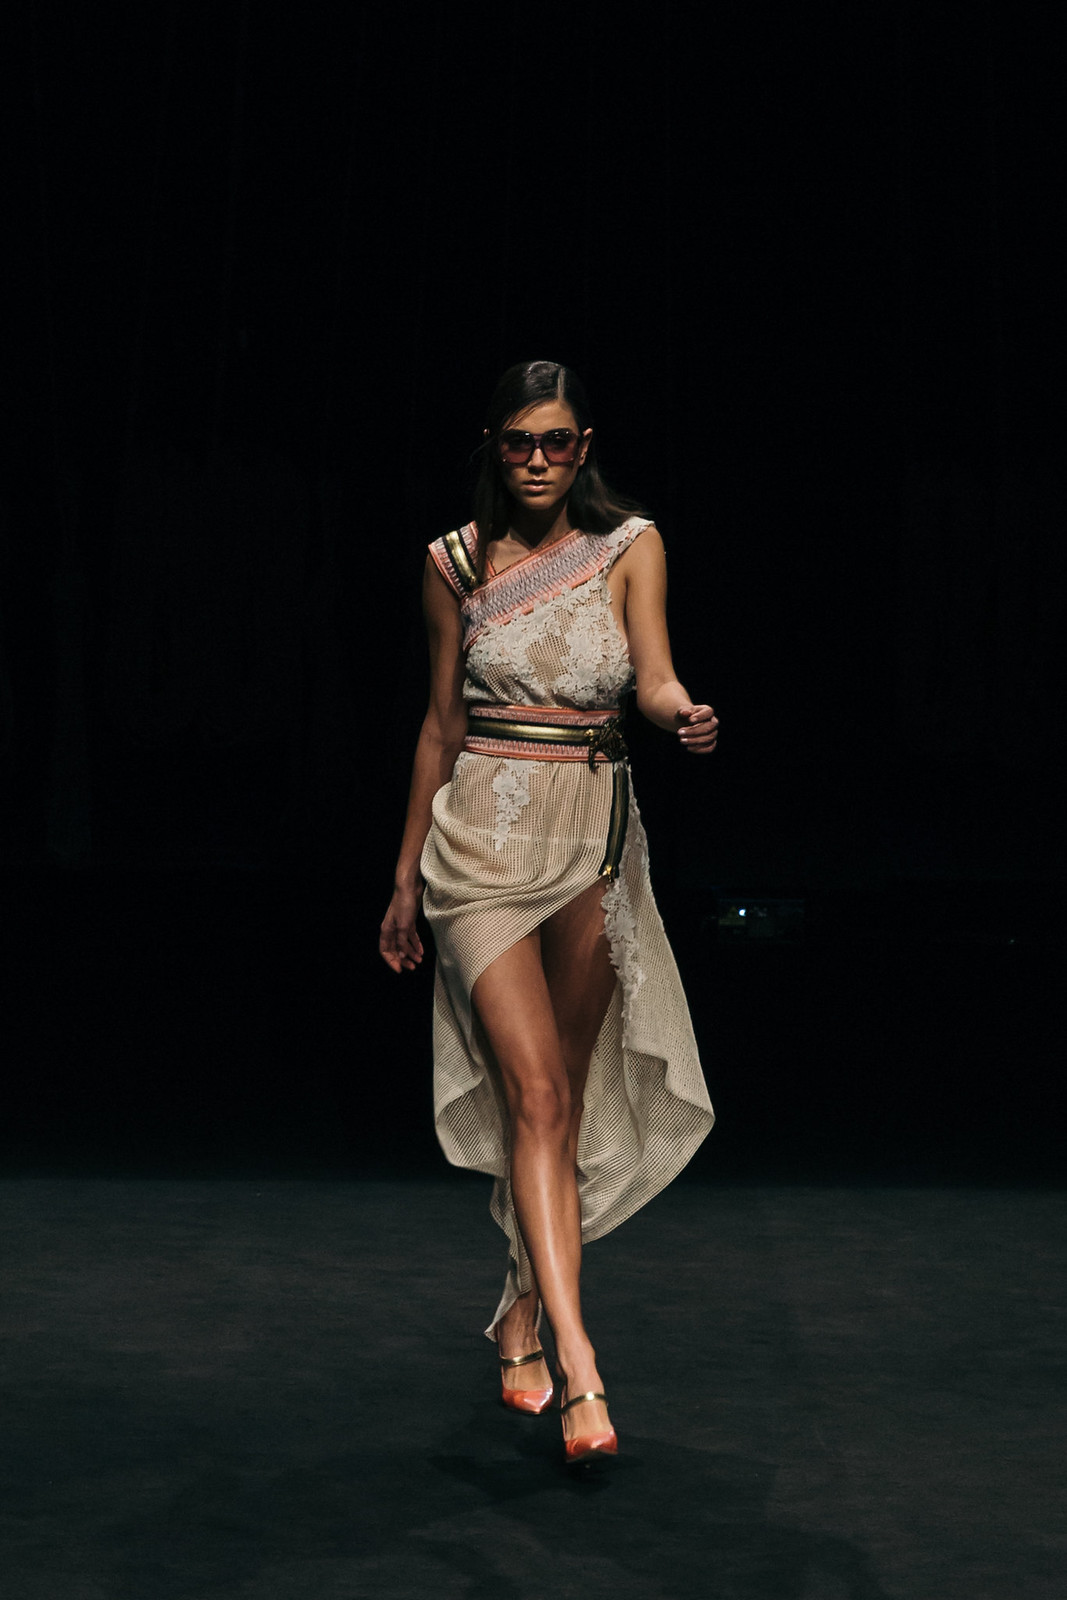 Jessie Chanes - Seams for a desire - 080 Bacelona Fashion #080bcnfasion -6